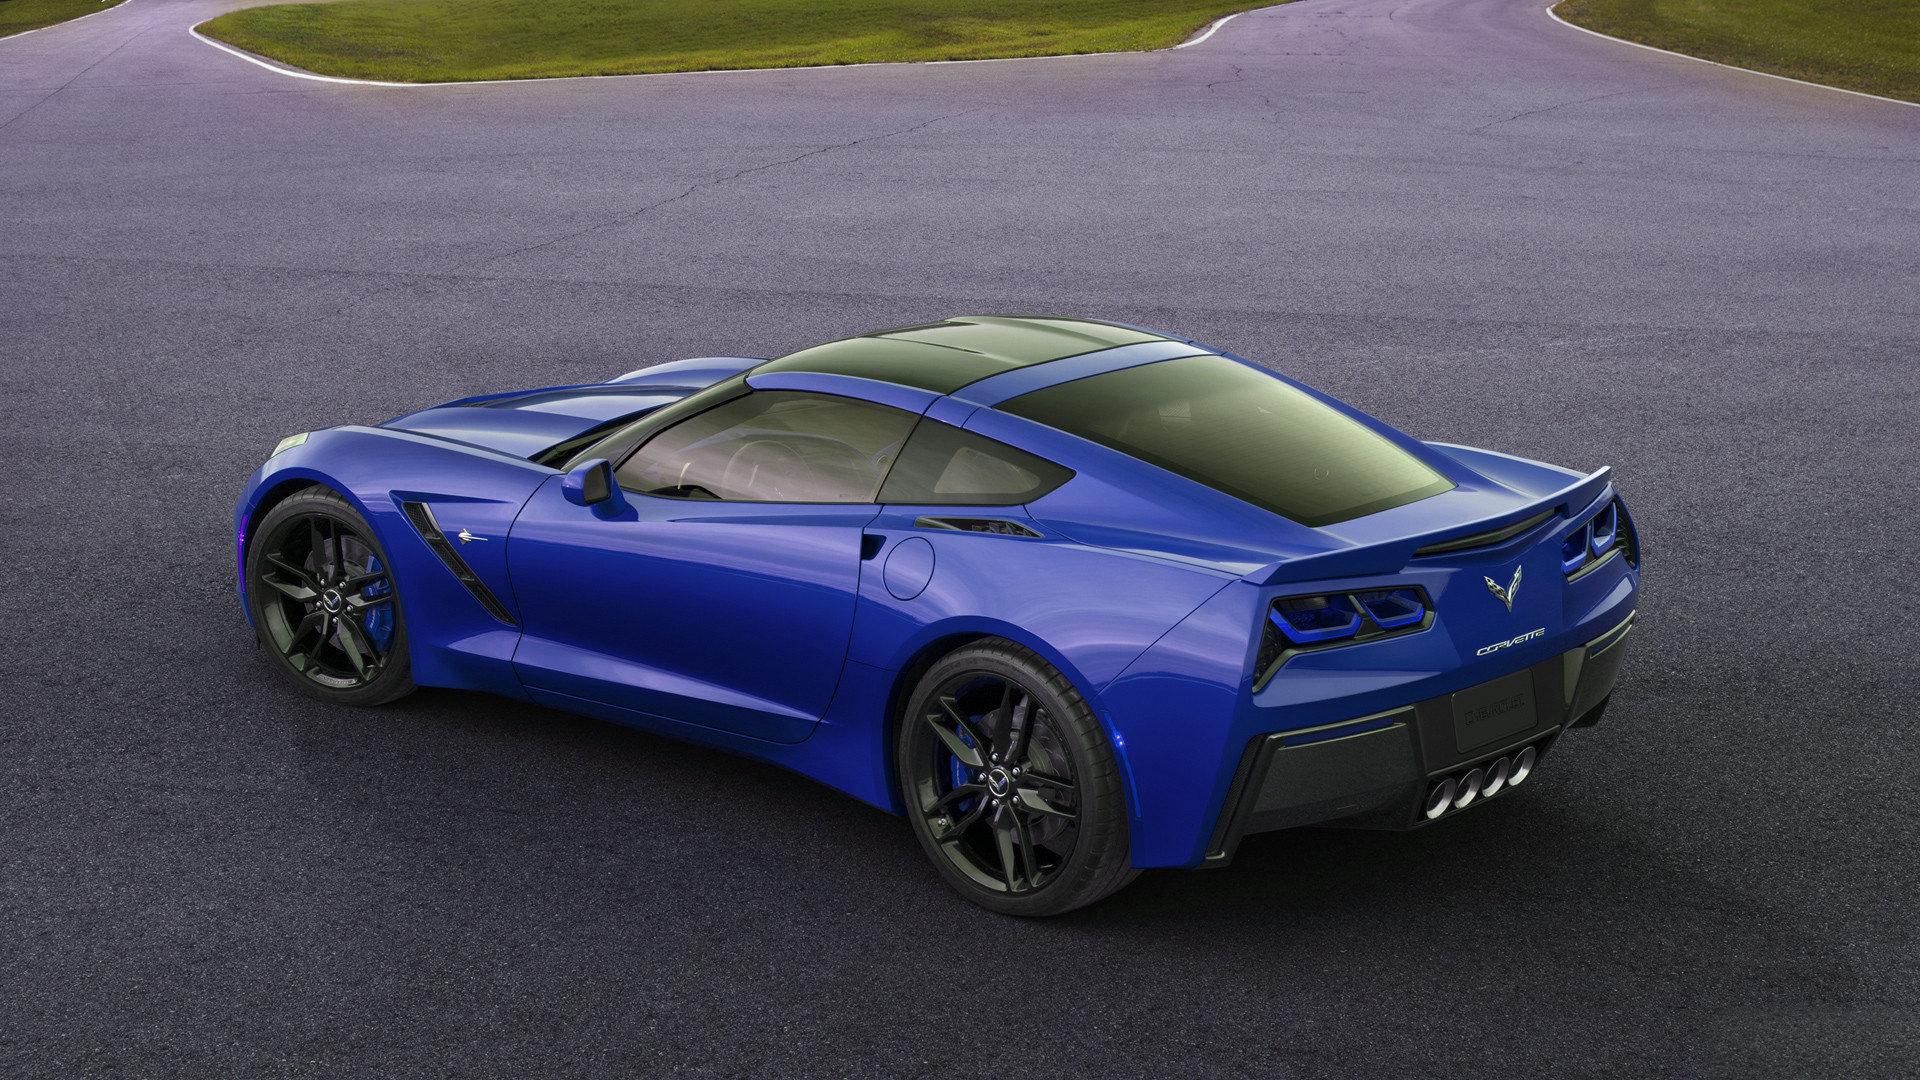 Blue Corvette C7 Stingray Auto 2014 1920x1080